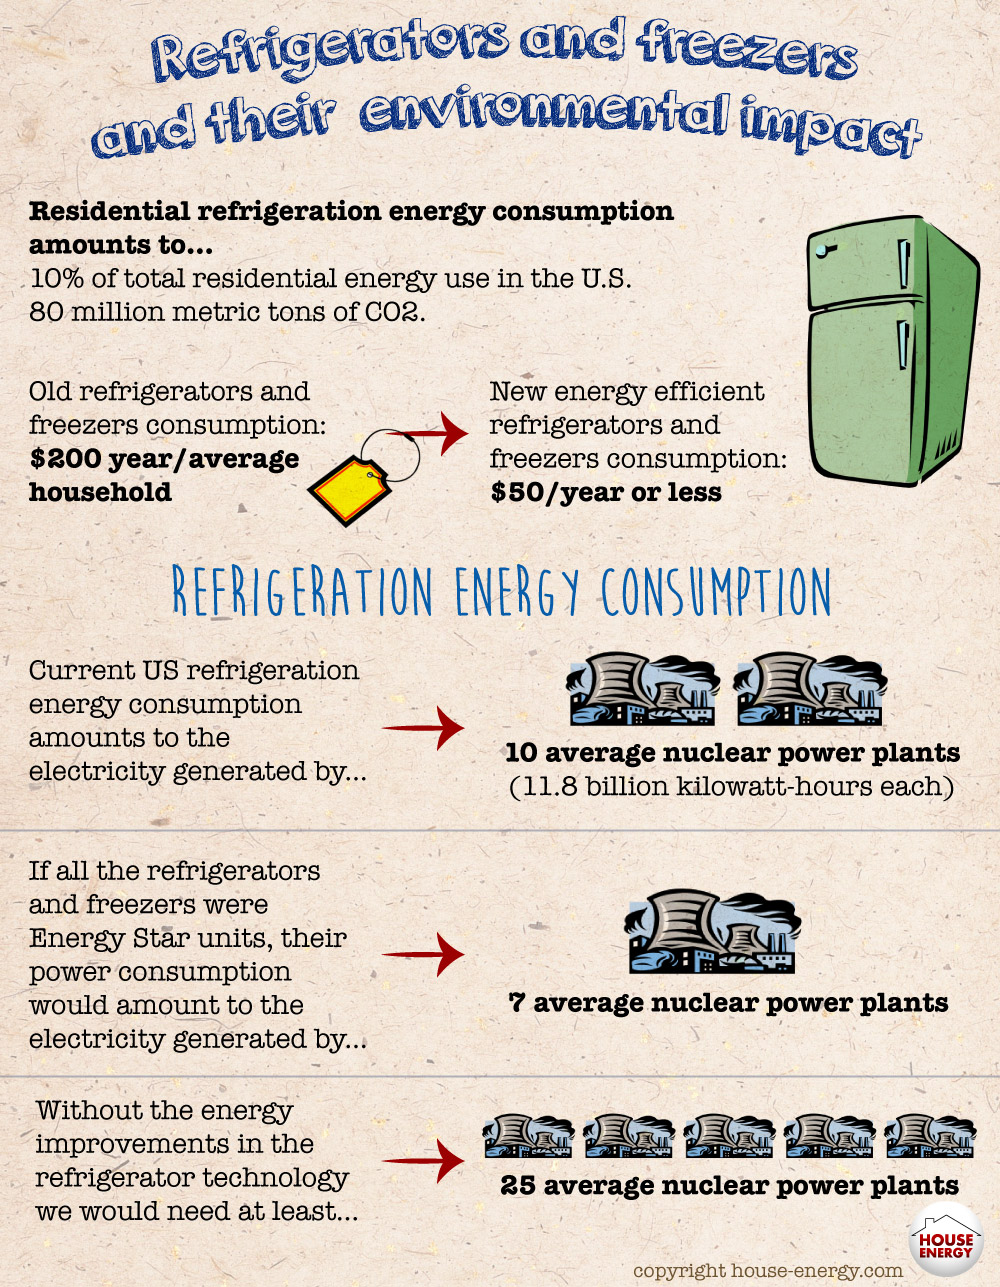 Refrigerators, freezers & environment